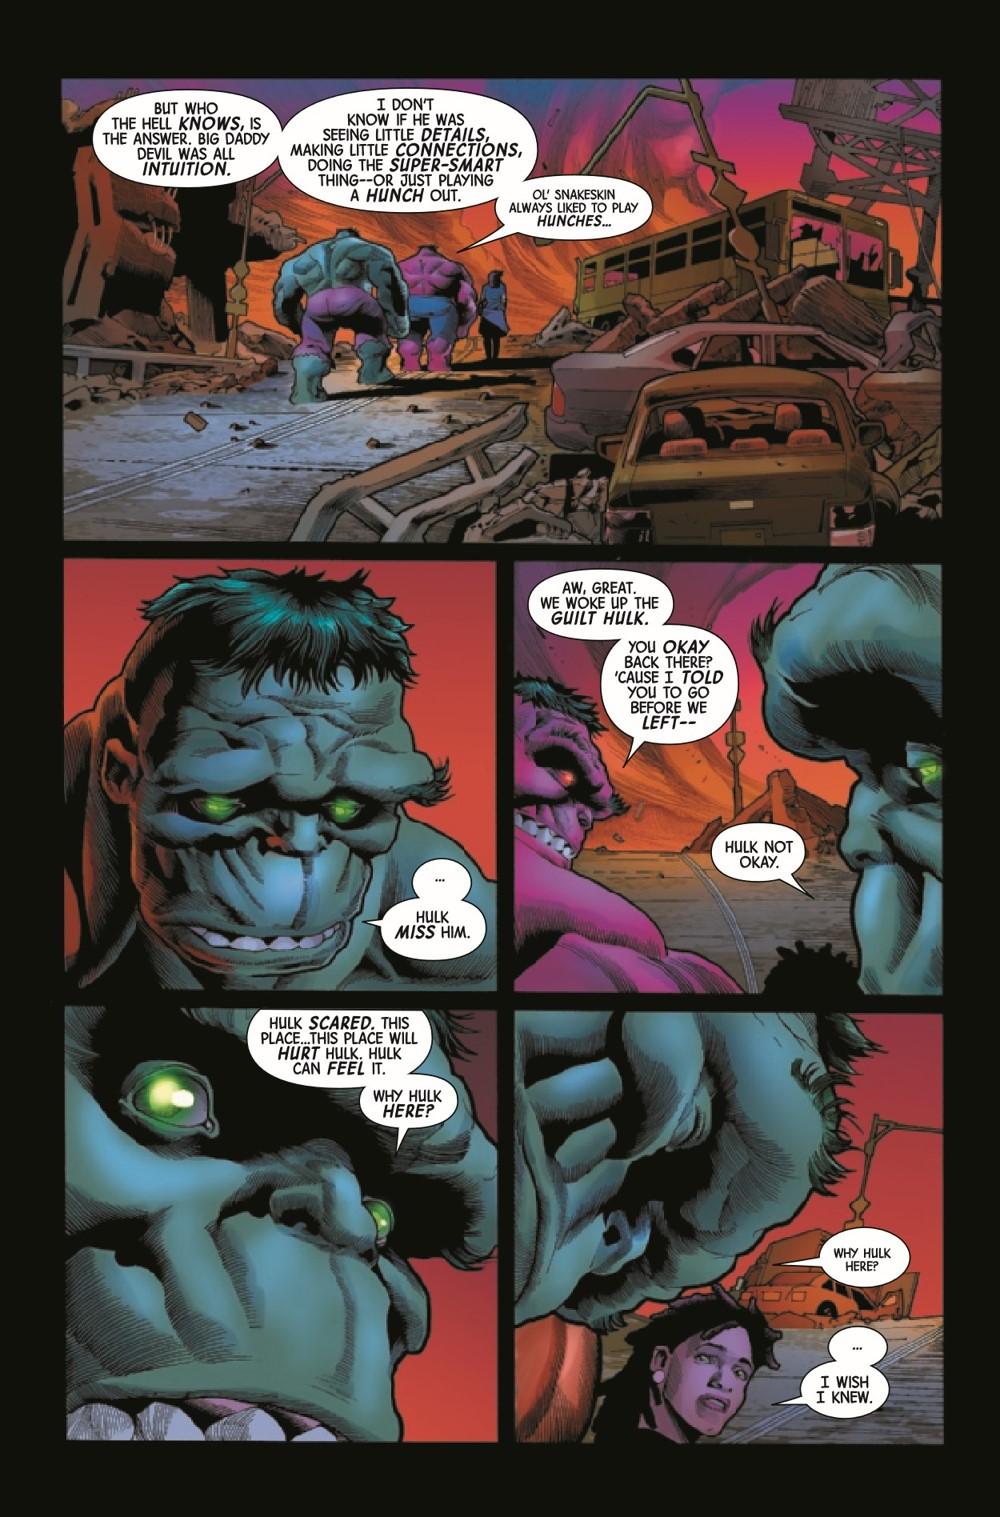 HULK2018050_Preview-4 ComicList Previews: IMMORTAL HULK #50